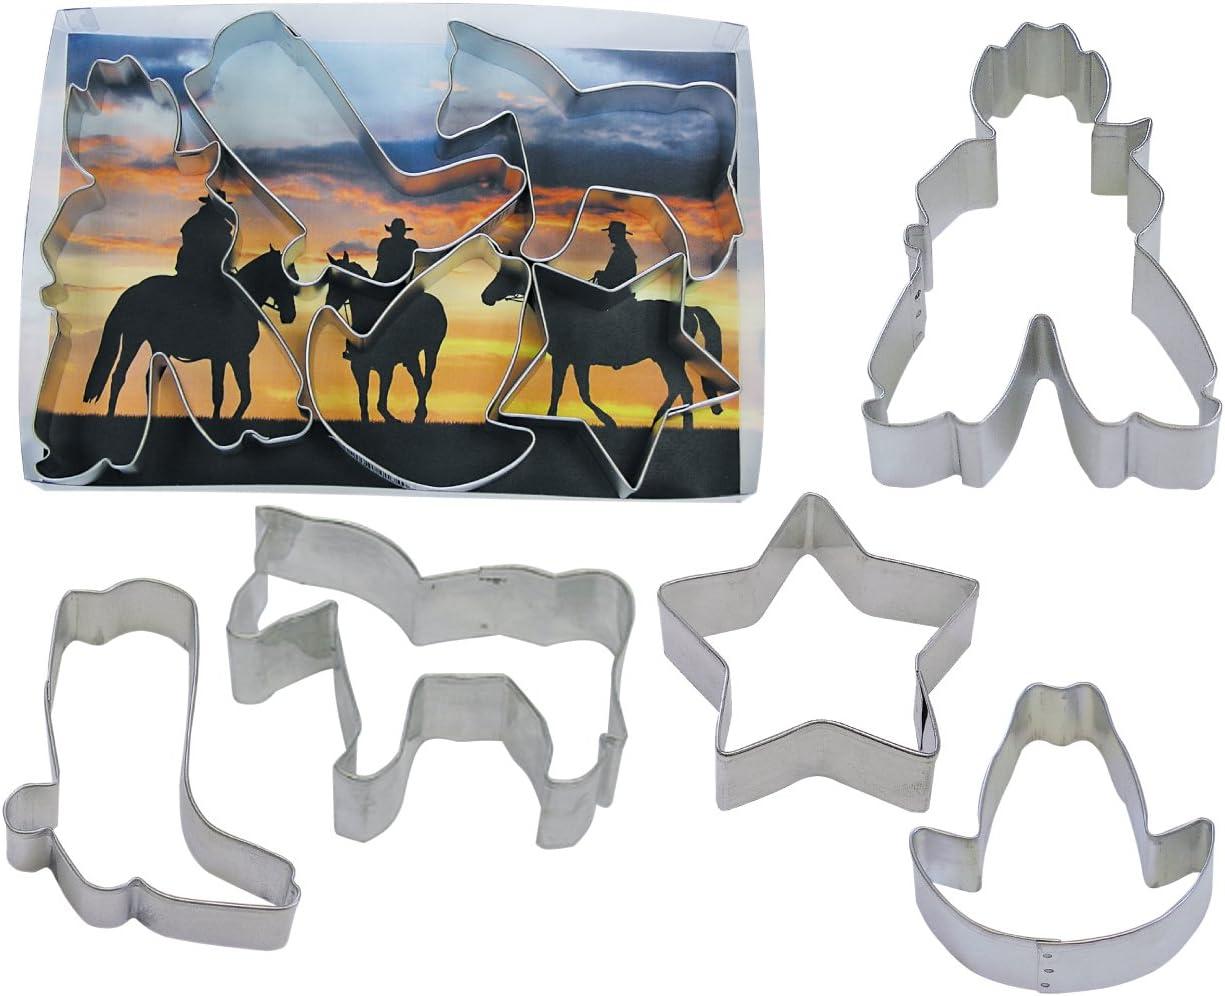 R&M International Cowboy Cookie Cutters, Star, Horse, Cowboy, Boot, Hat, 5-Piece Set